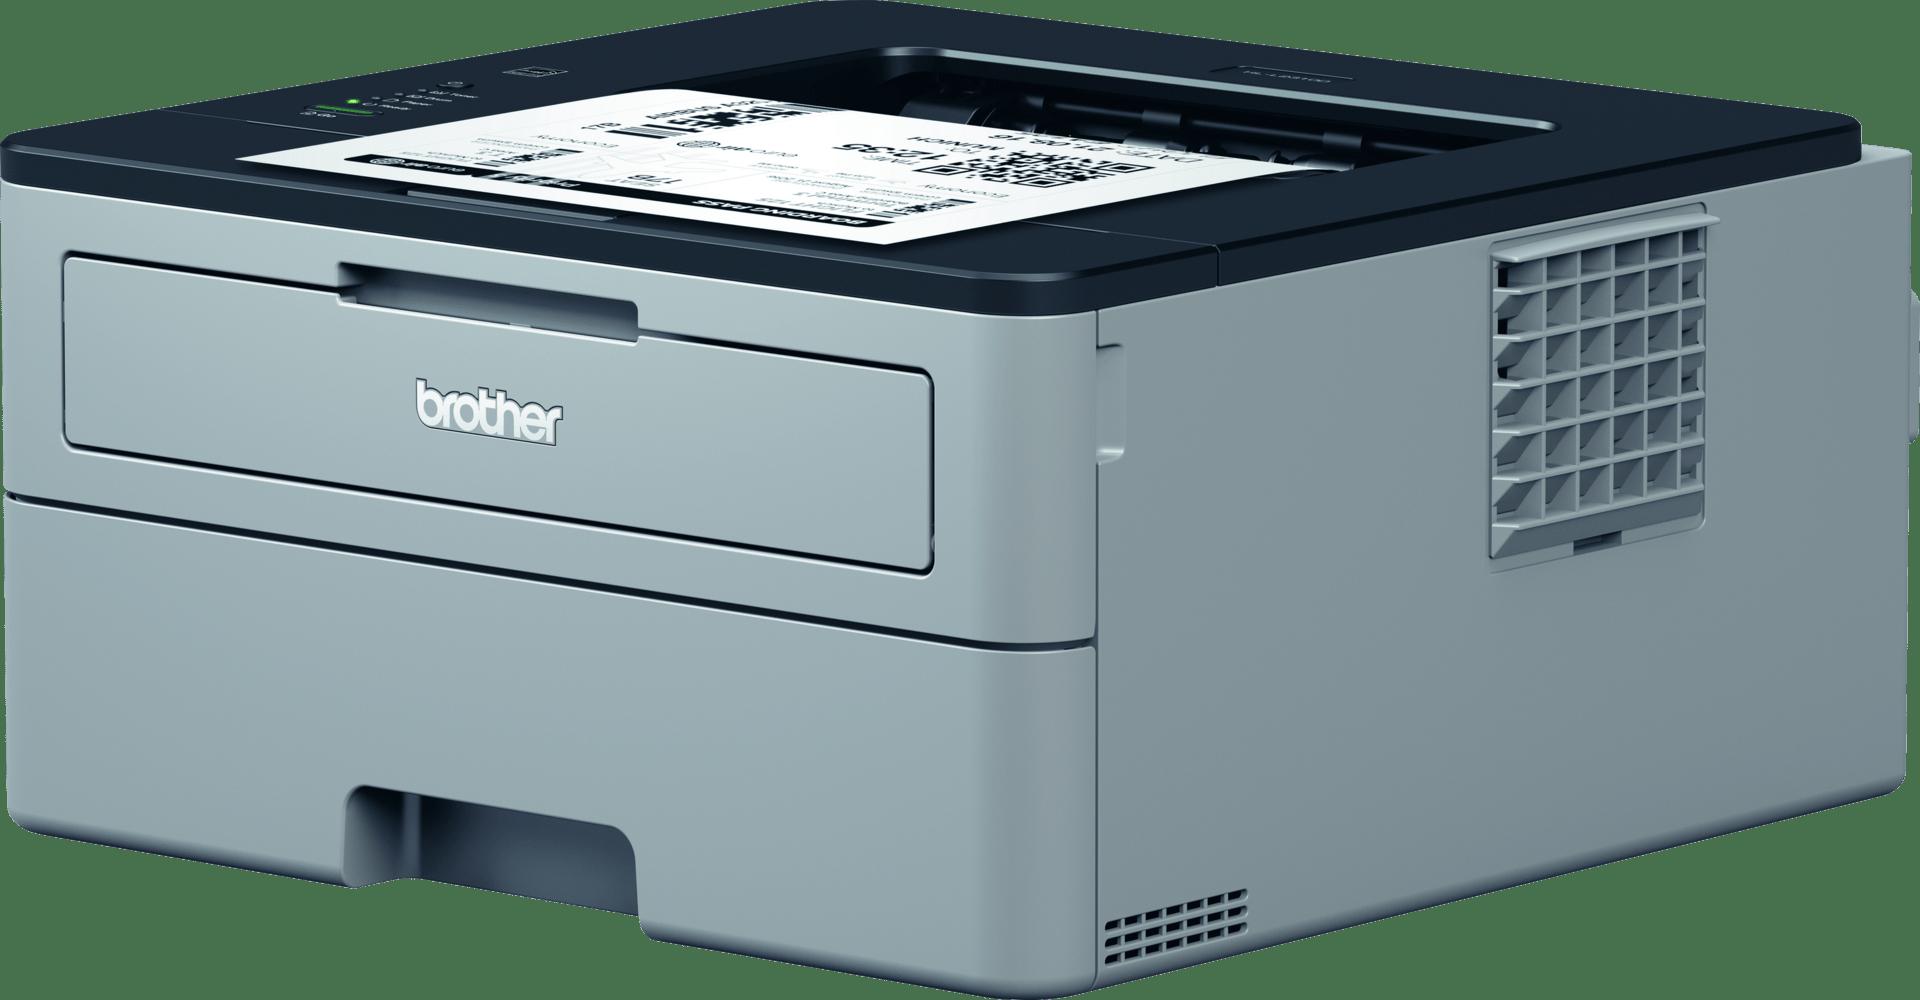 Brother laserprinter